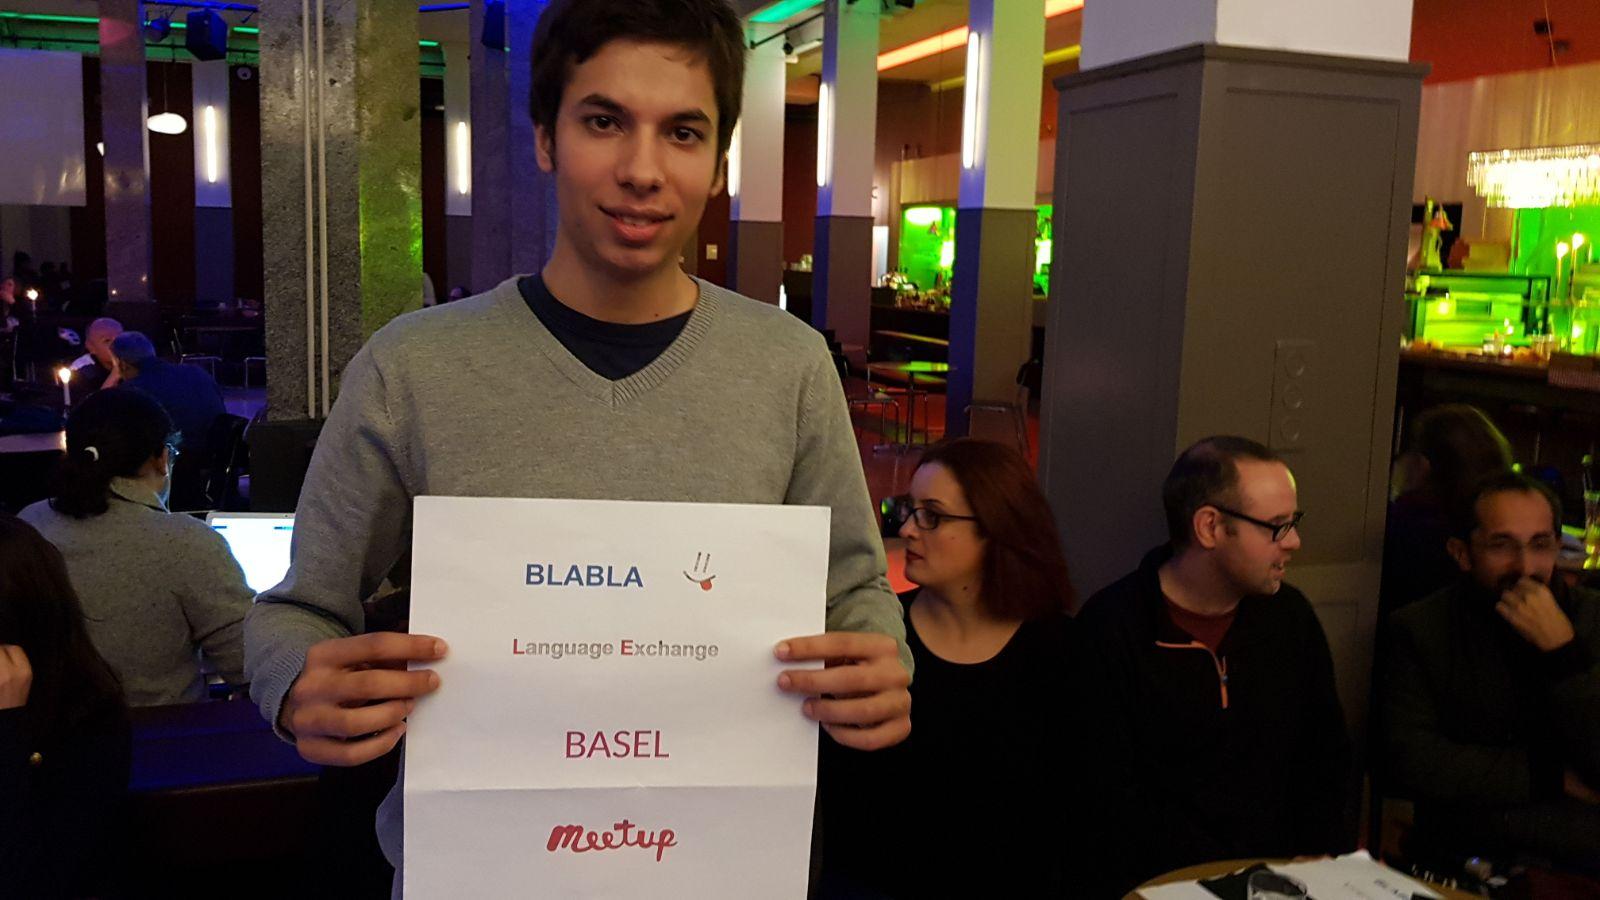 BlaBla Basel